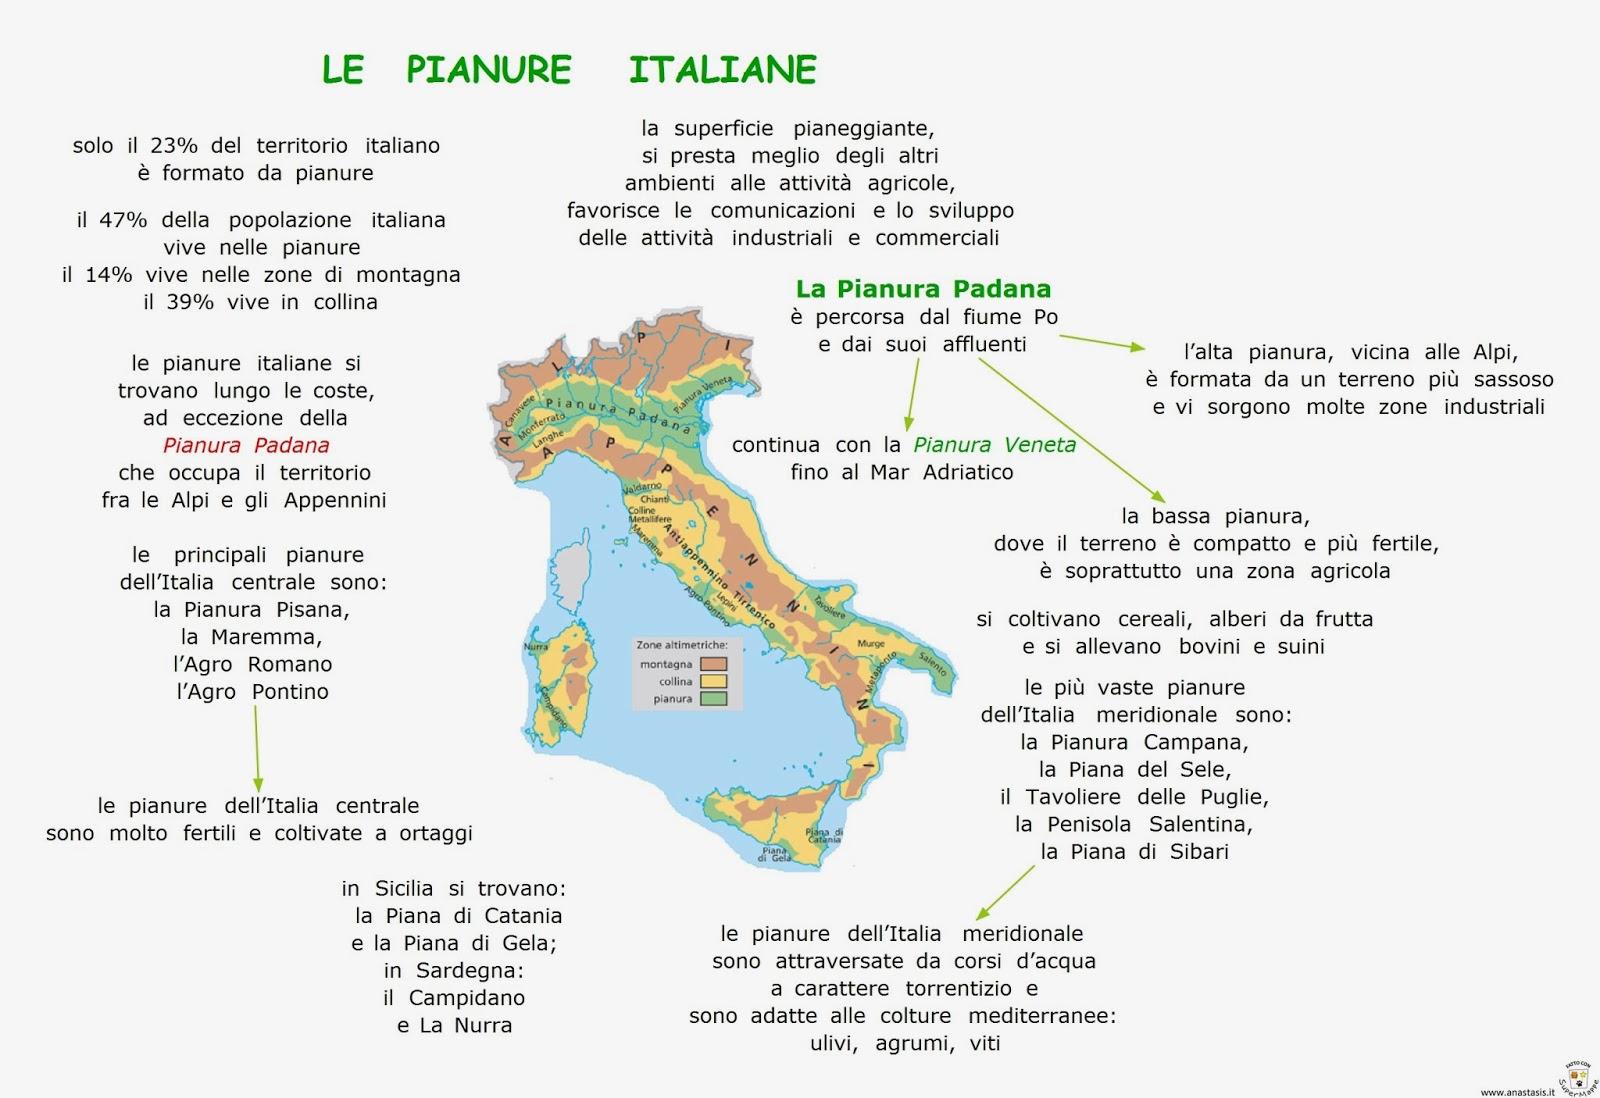 La Pianura Le Pianure In Italia E In Europa Lessons Tes Teach